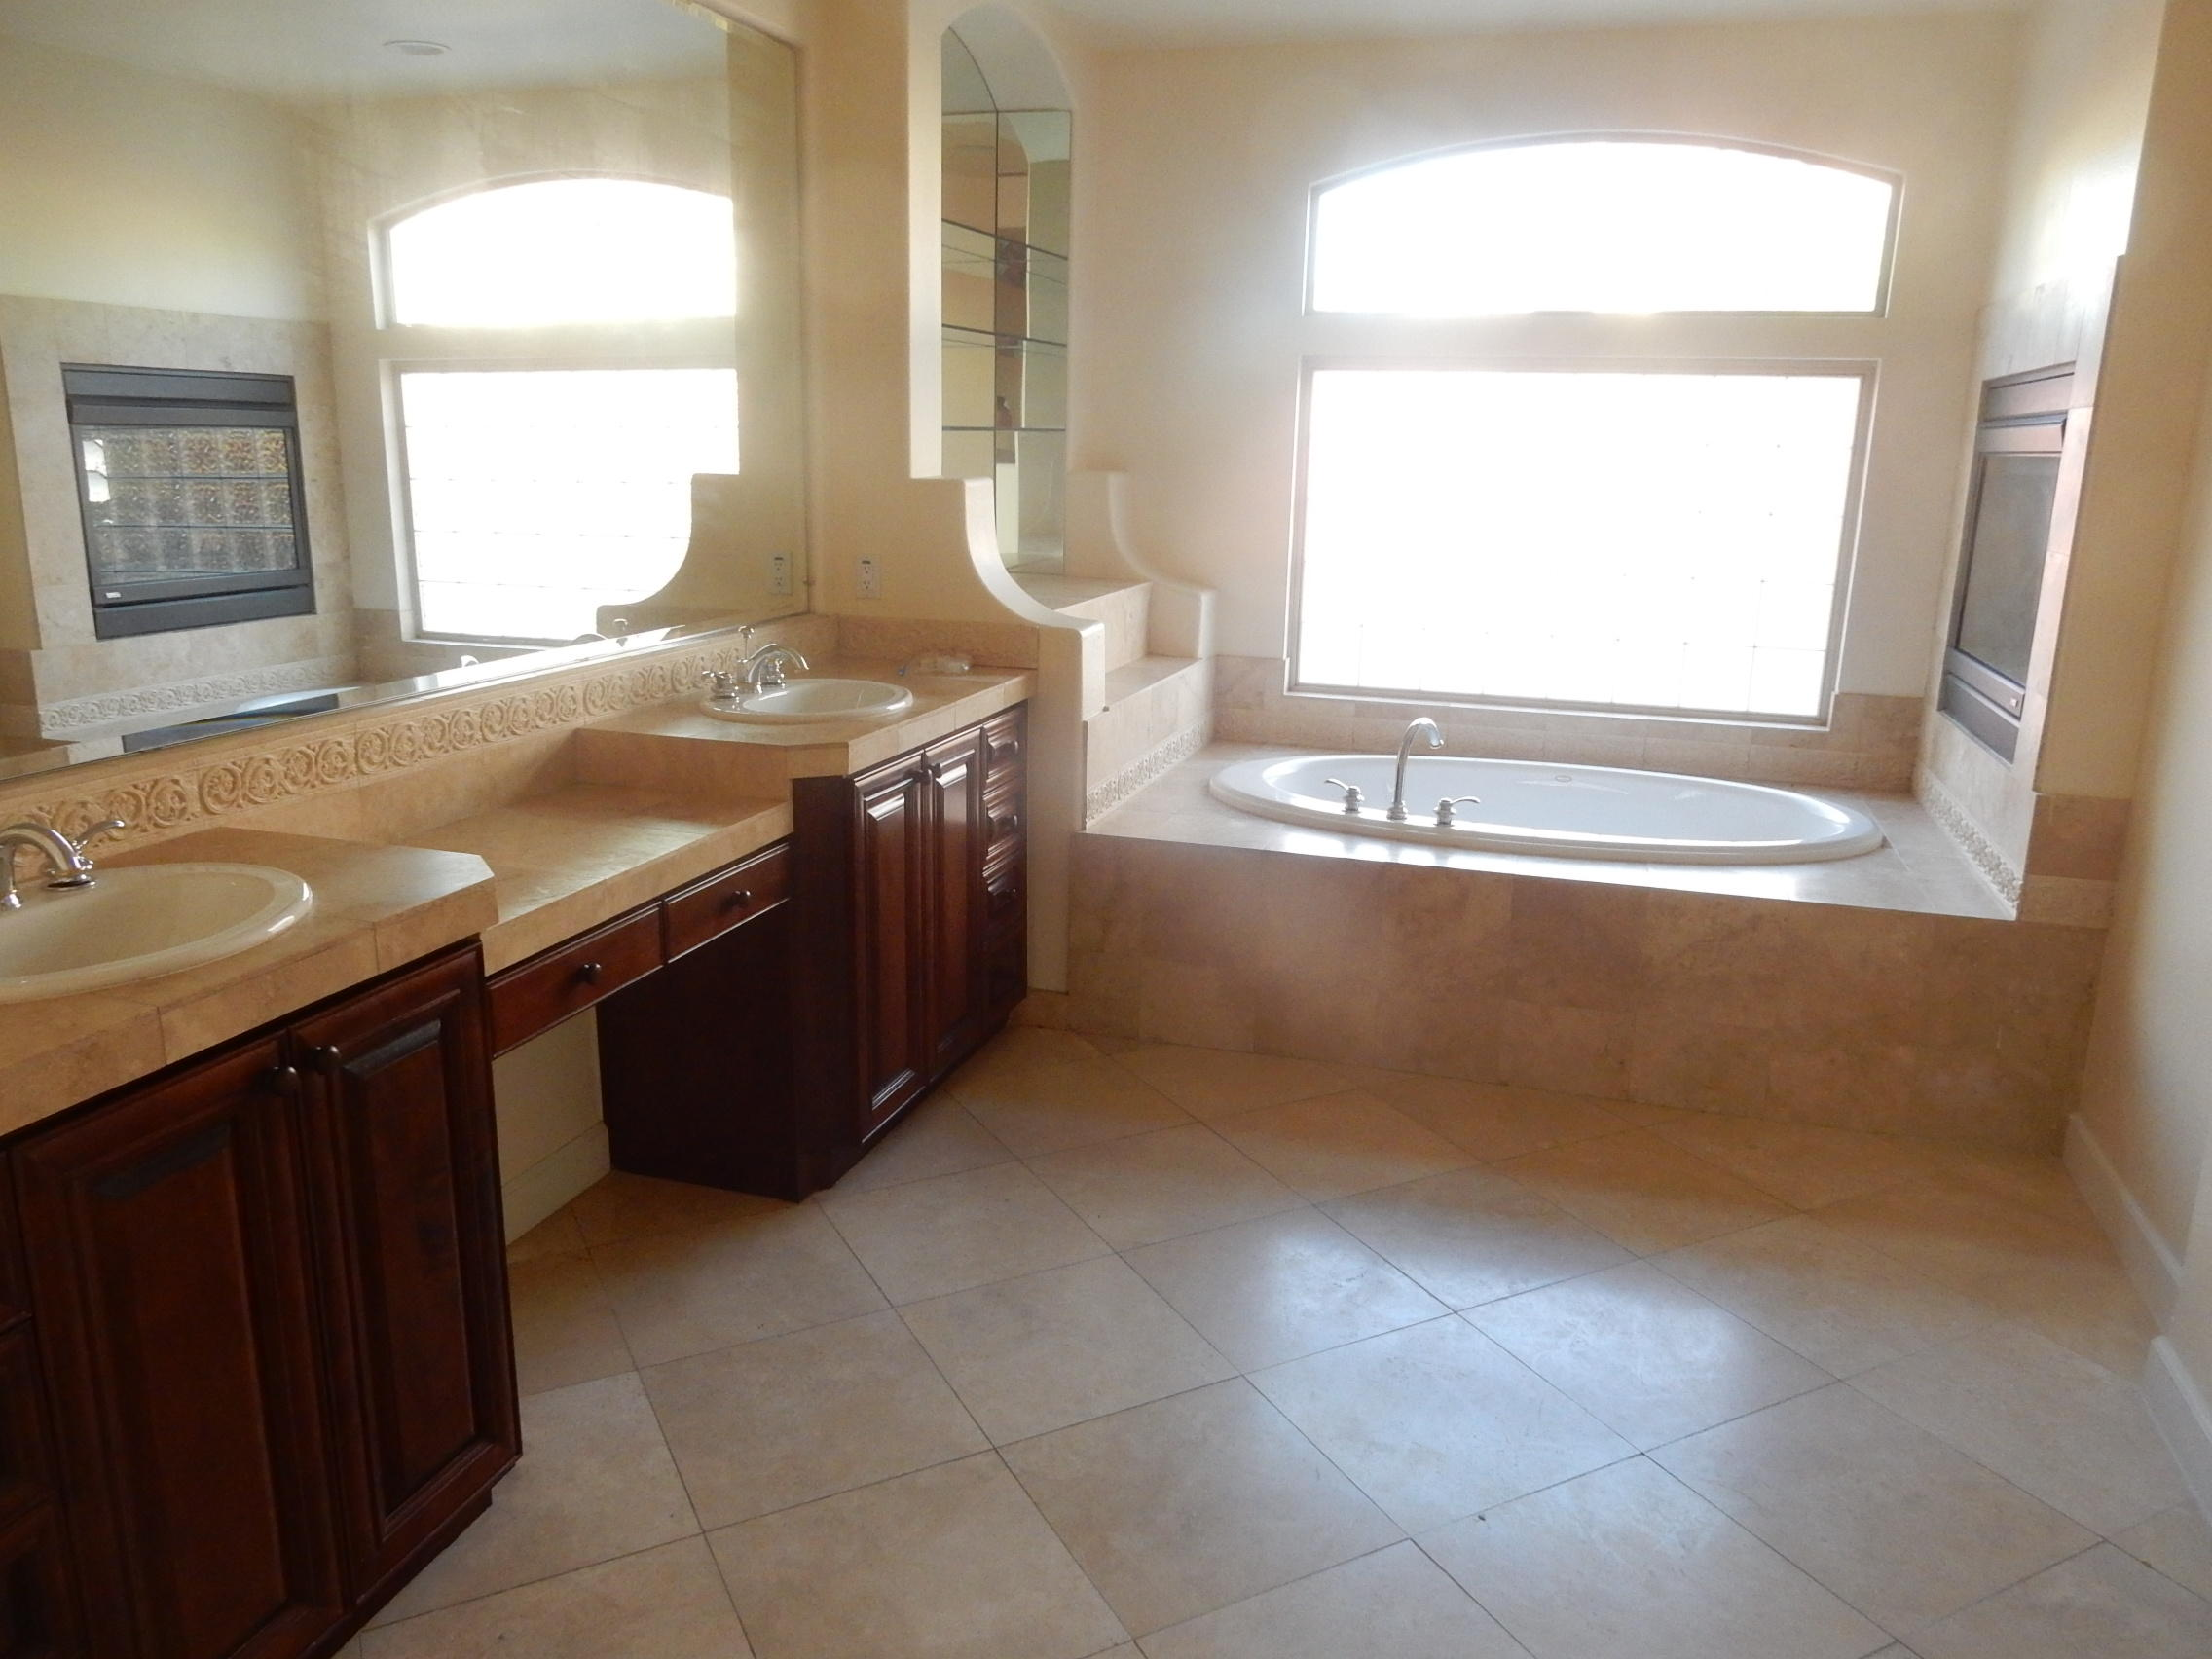 18 Porto Cielo Court, Rancho Mirage, California 92270, 4 Bedrooms Bedrooms, ,4 BathroomsBathrooms,Residential,For Sale,18 Porto Cielo Court,219041337